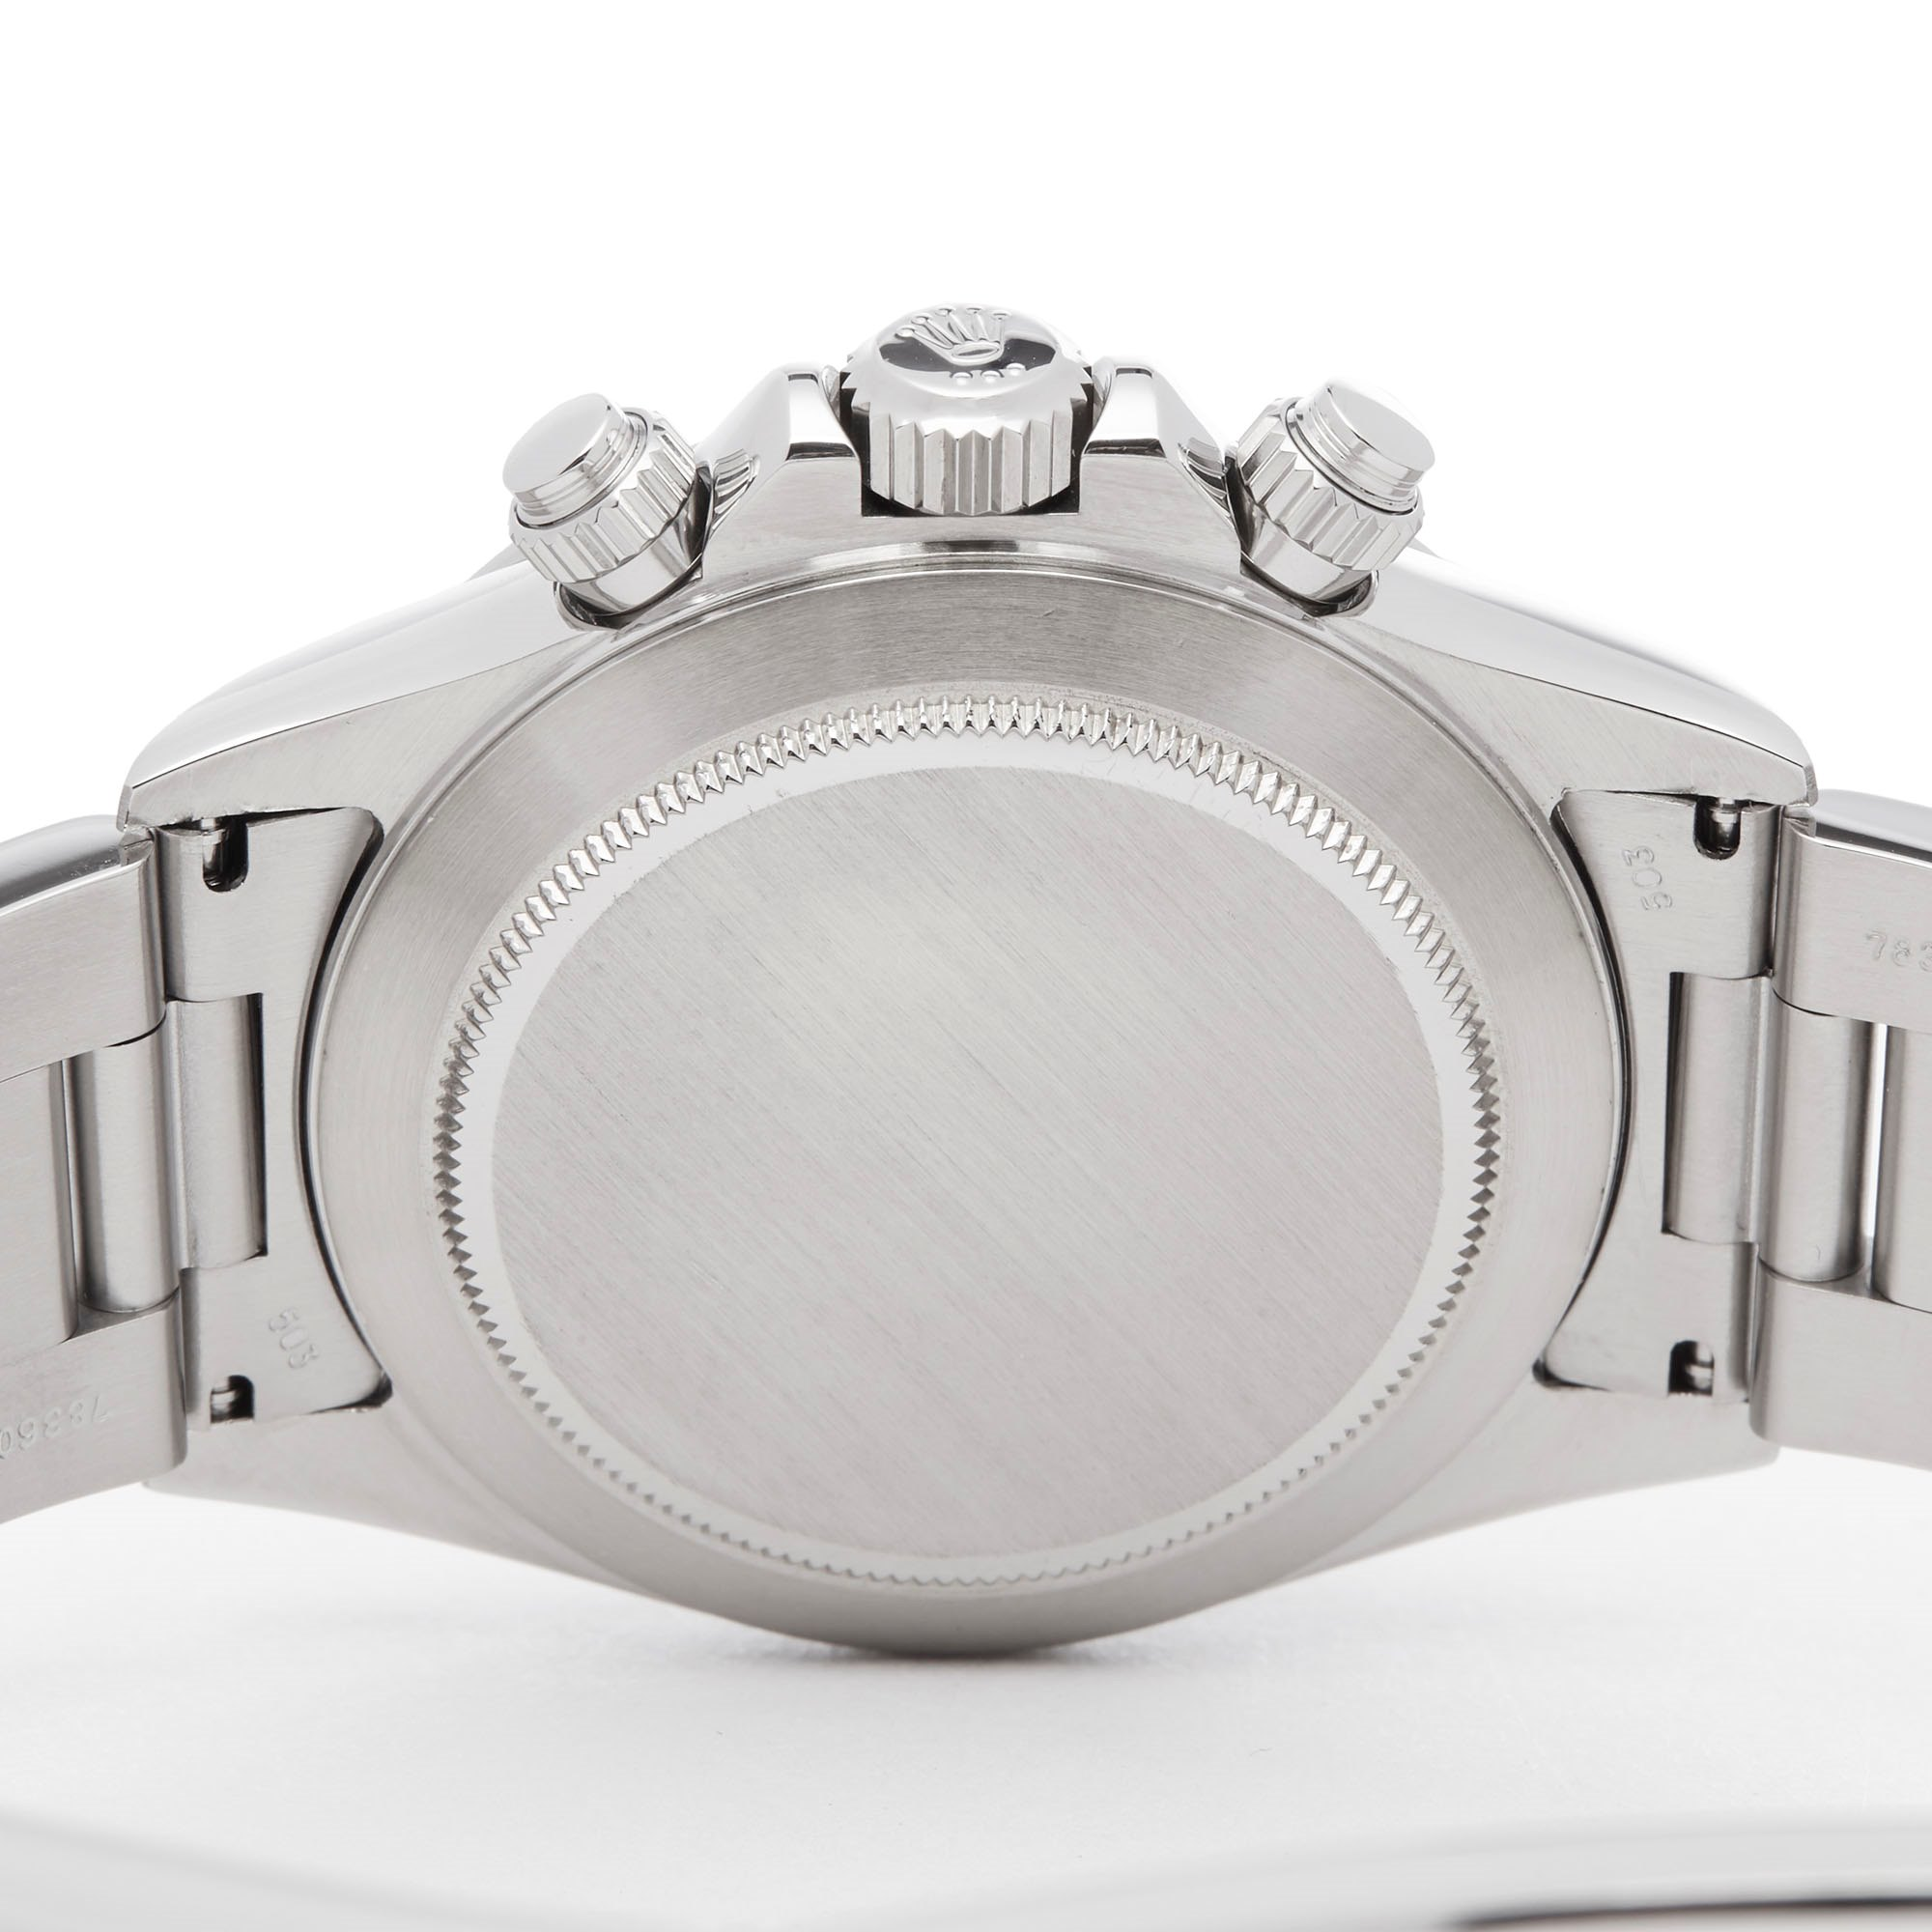 Rolex Daytona Zenith Inverted 6 Chronograph Stainless Steel 16520